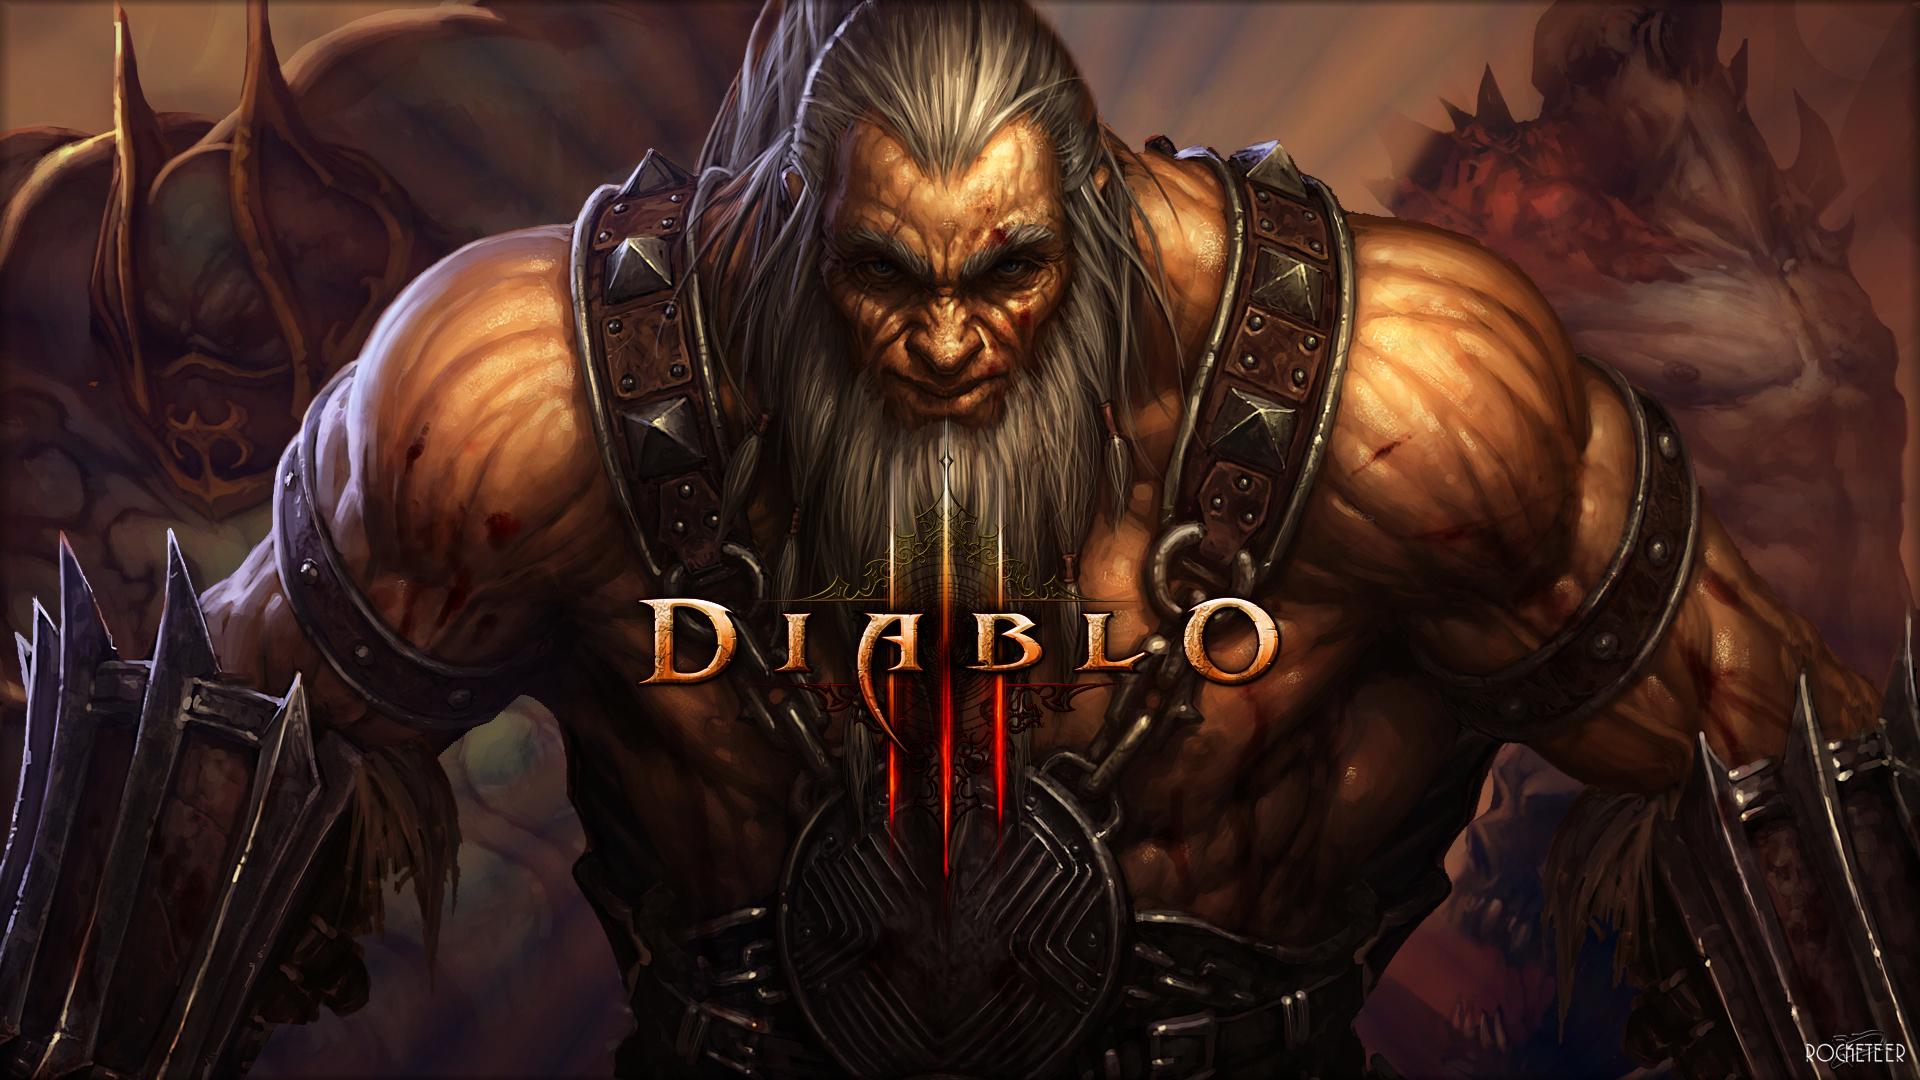 Diablo 3 Barbar 1920x1080